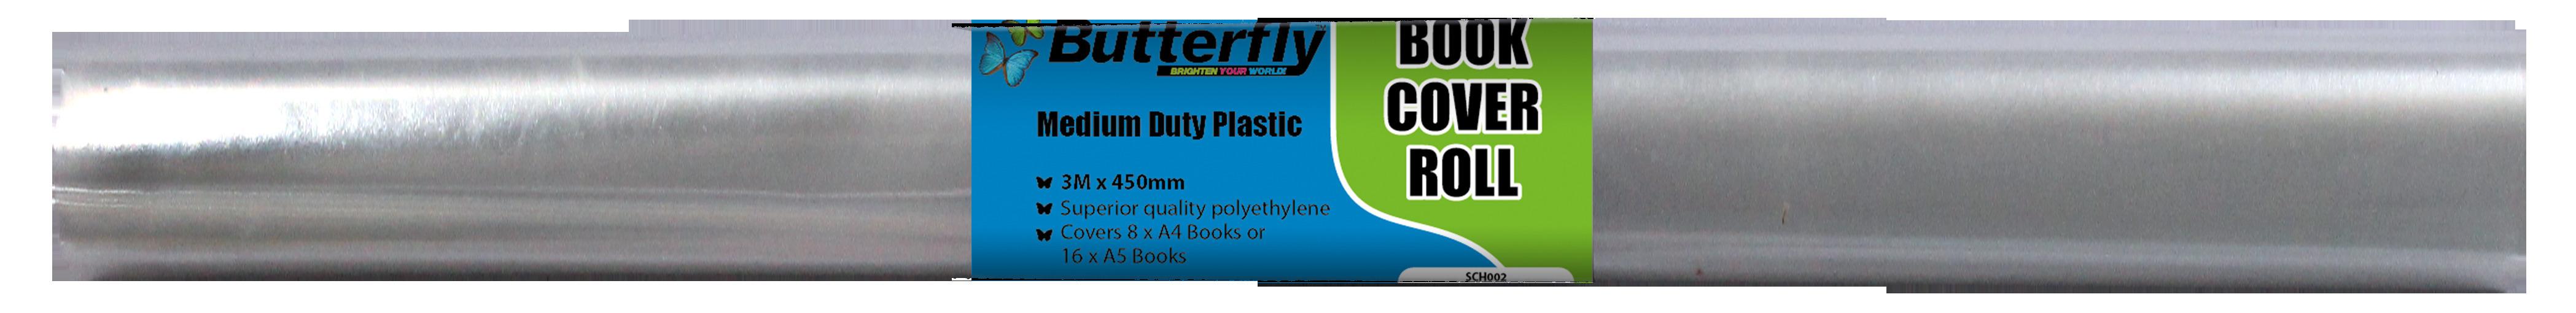 Book Cover Roll - Medium Duty 50 Micron (3m x 480mm)